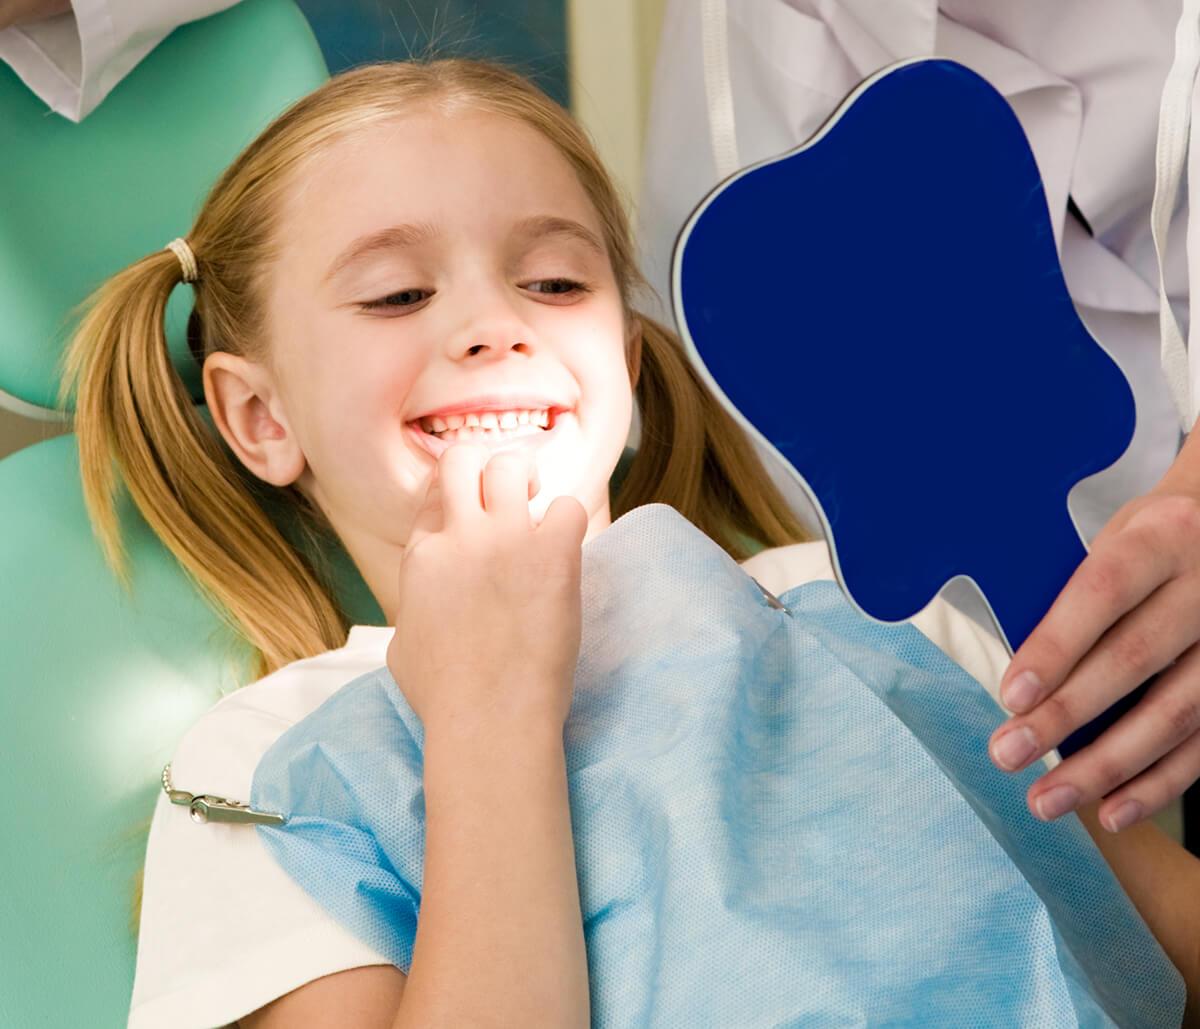 Kids Friendly Dentist in Fort Worth TX Area